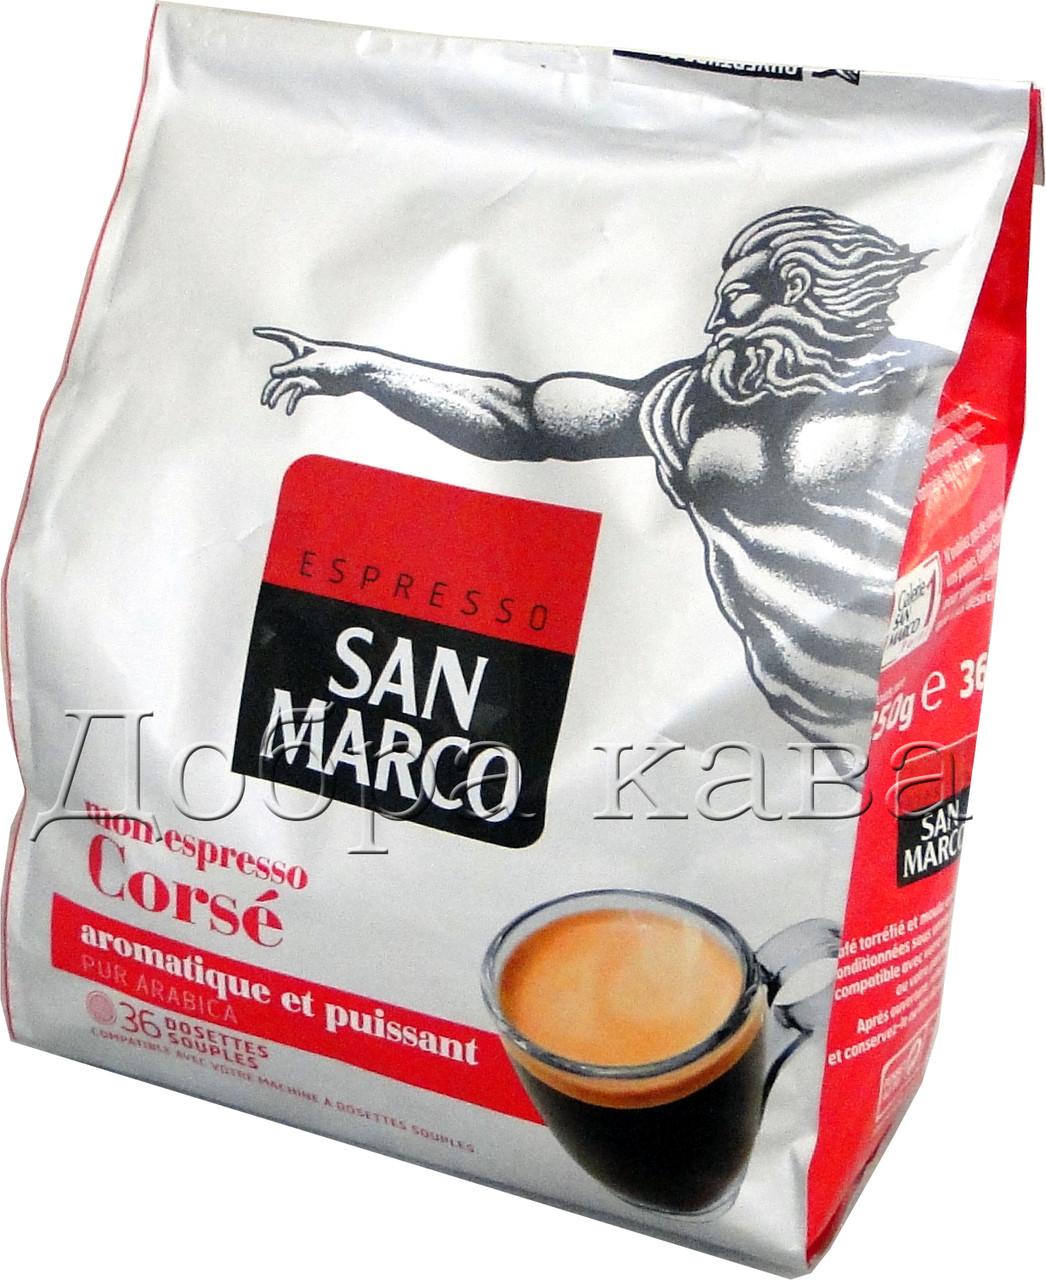 Кофе в чалдах для Philips Senseo 36 шт San Marco CORSE (100% Арабика)